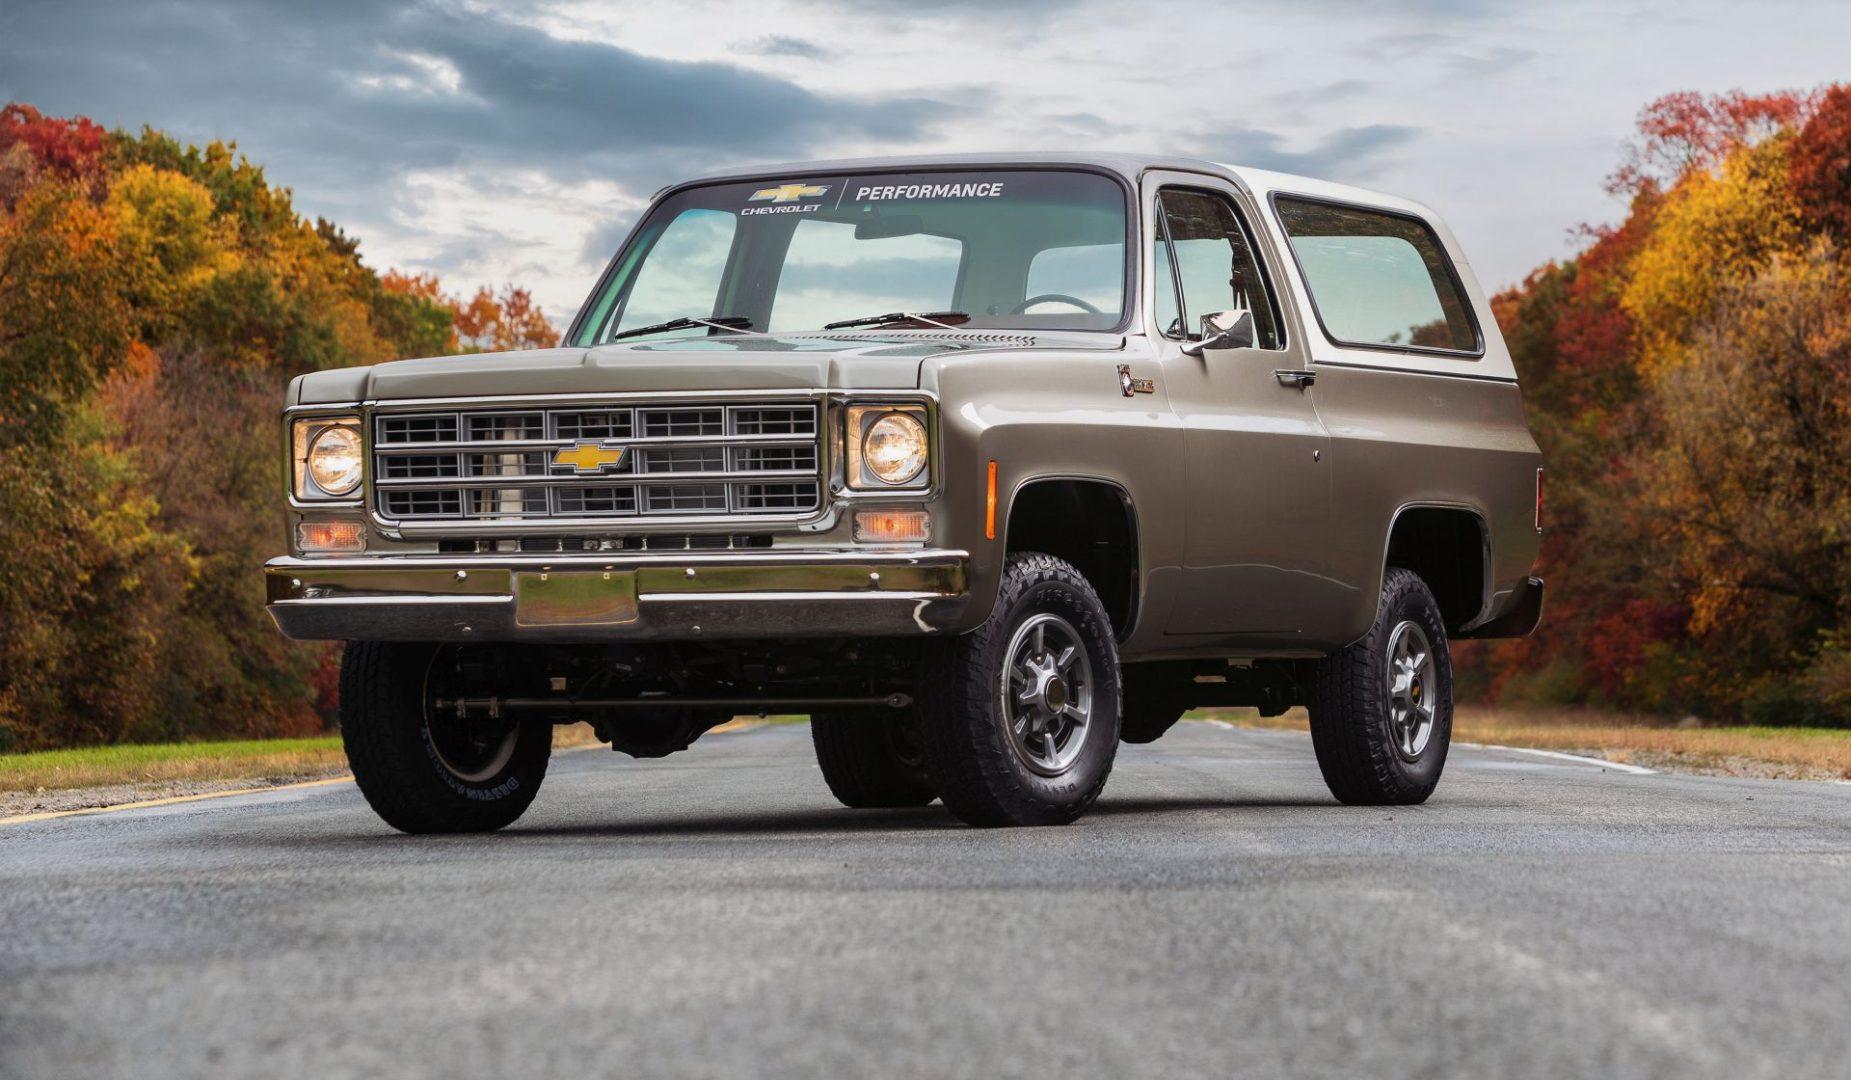 Kad se spoje prošlost i sadašnjost: 1977 Chevrolet K5 Blazer-E koncept